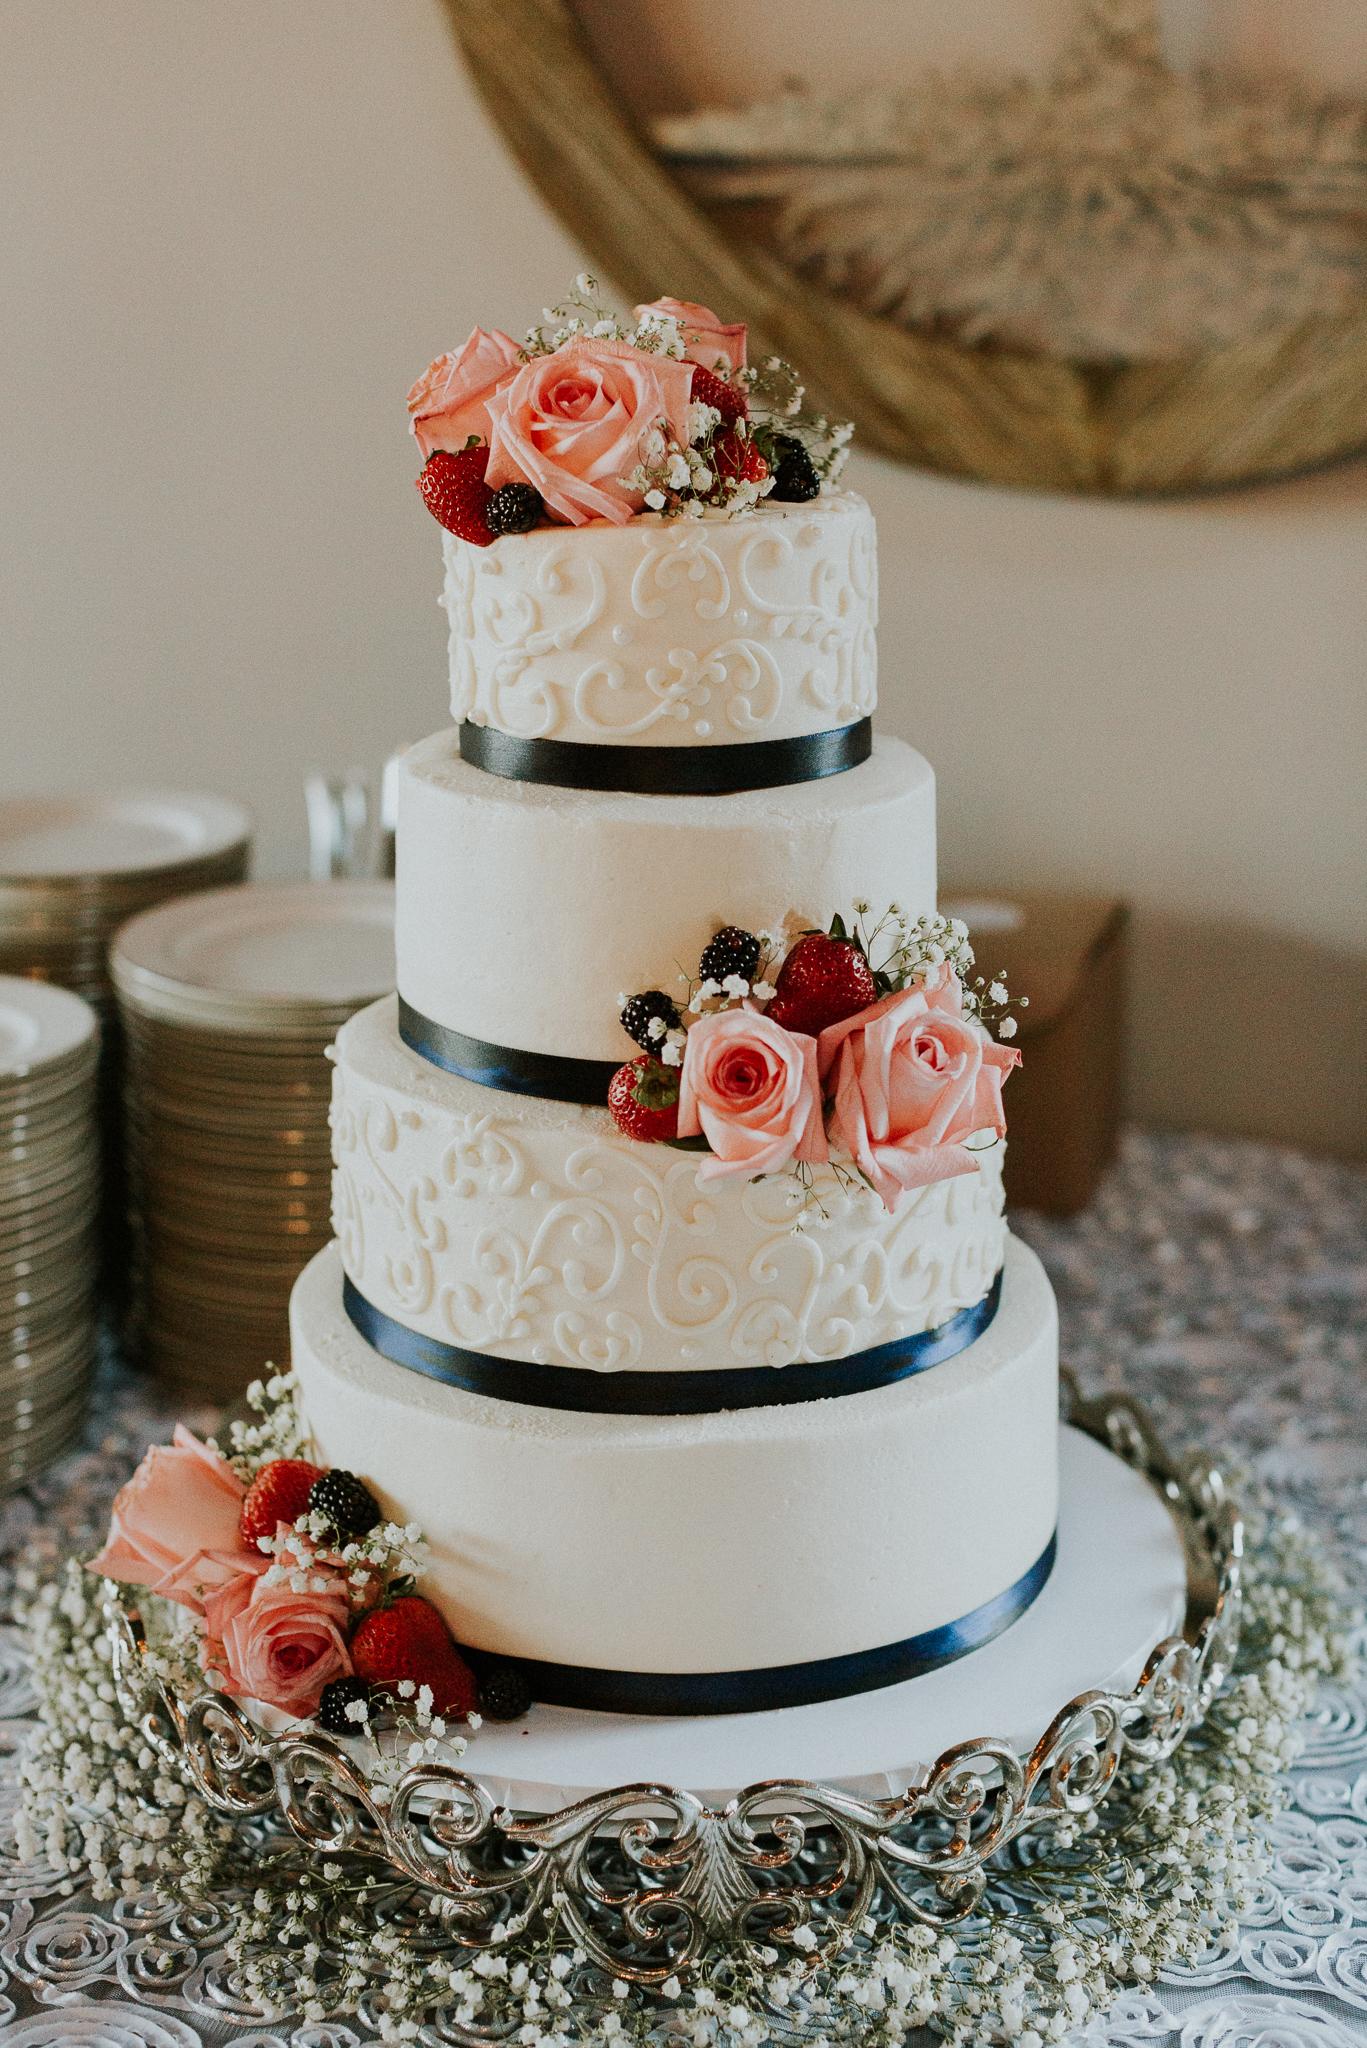 east-tn-wedding-photographer-tennessee-elopement-photographer-kingsport-tn-wedding-photographer (44 of 50).jpg